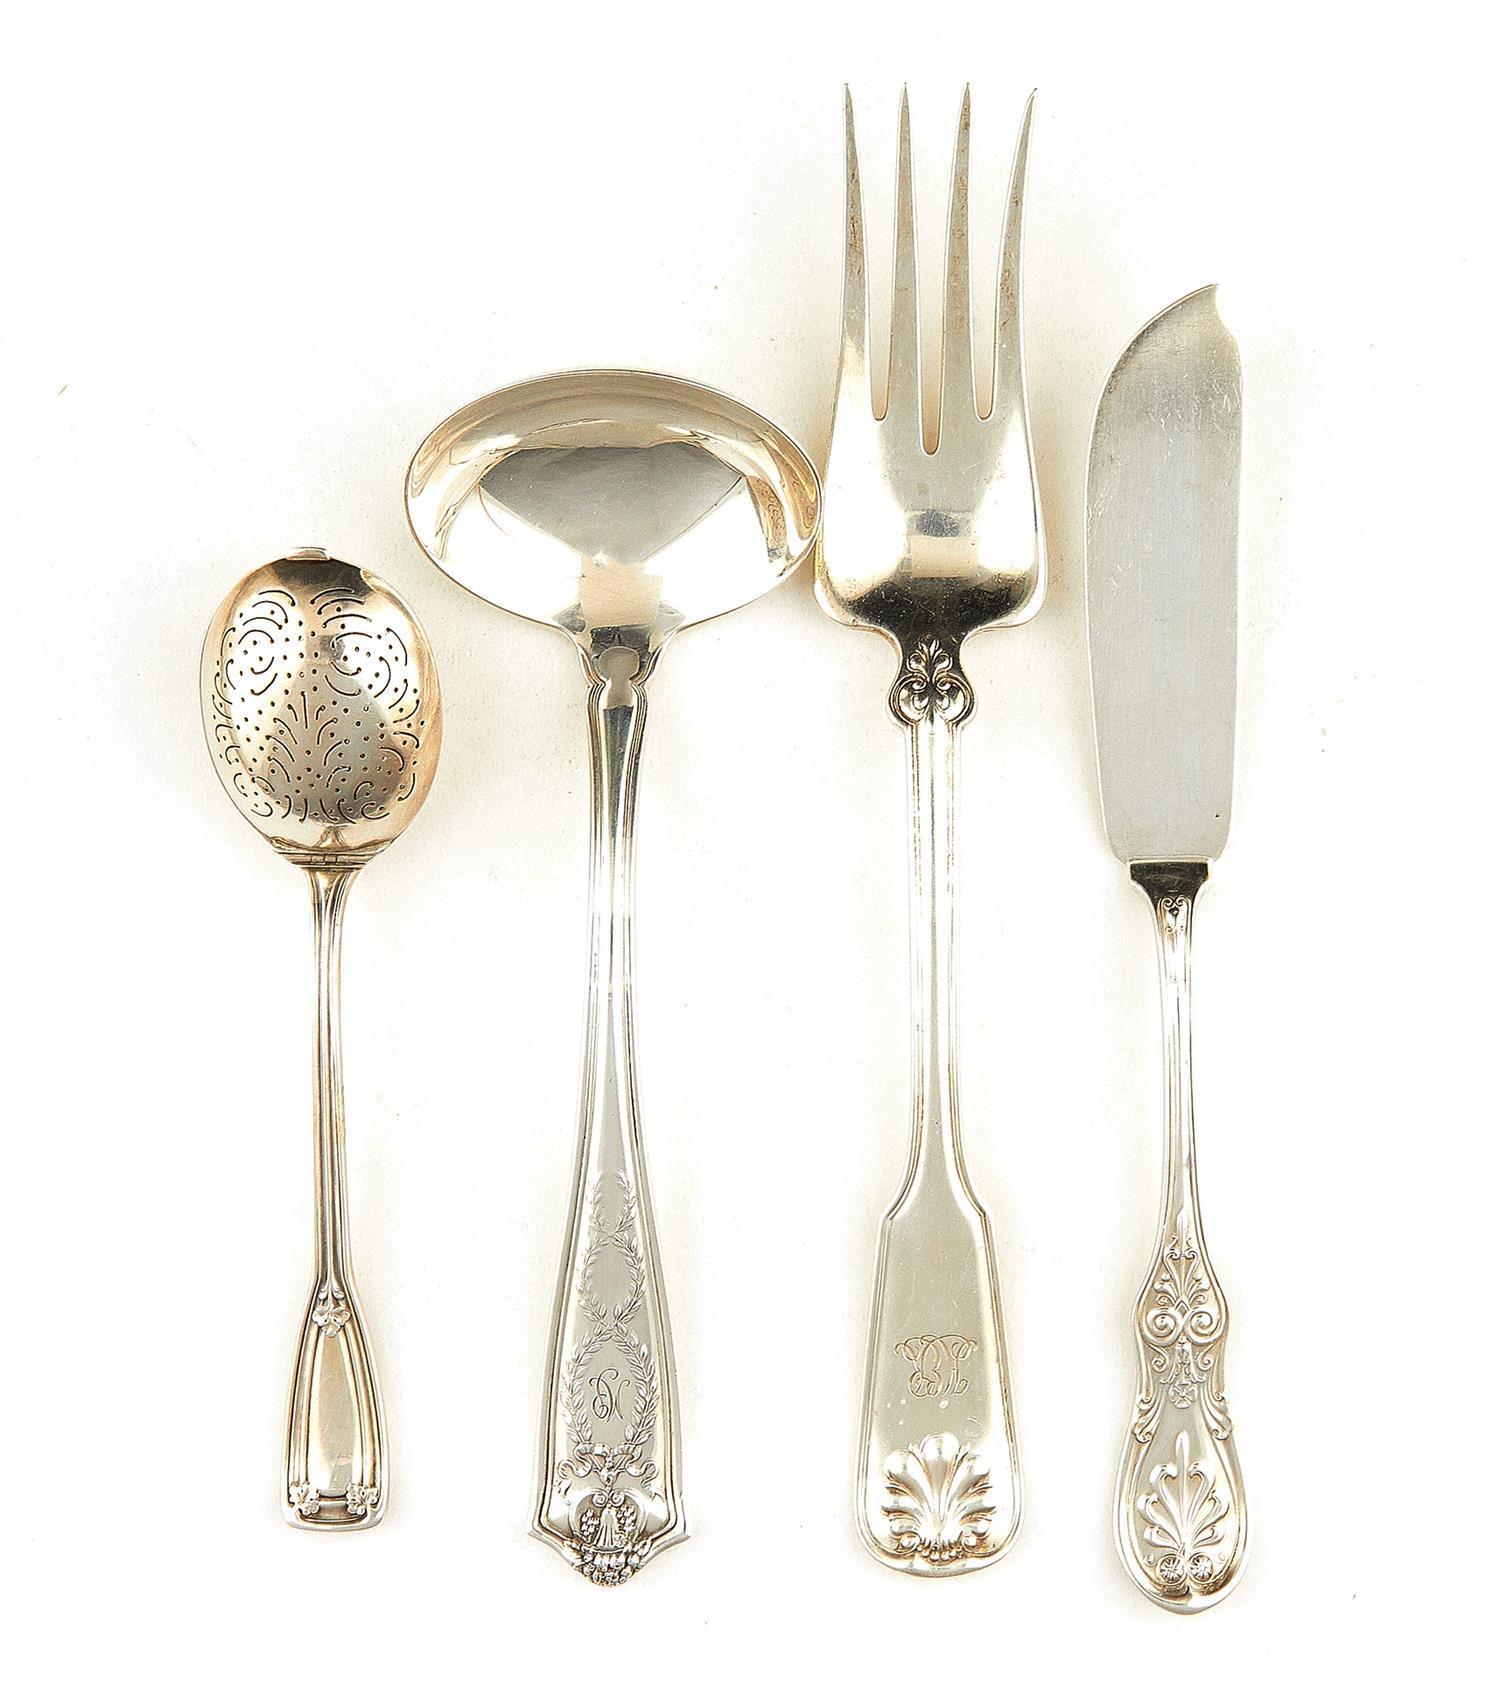 American silver flatware pieces, Tiffany & Co (6pcs)